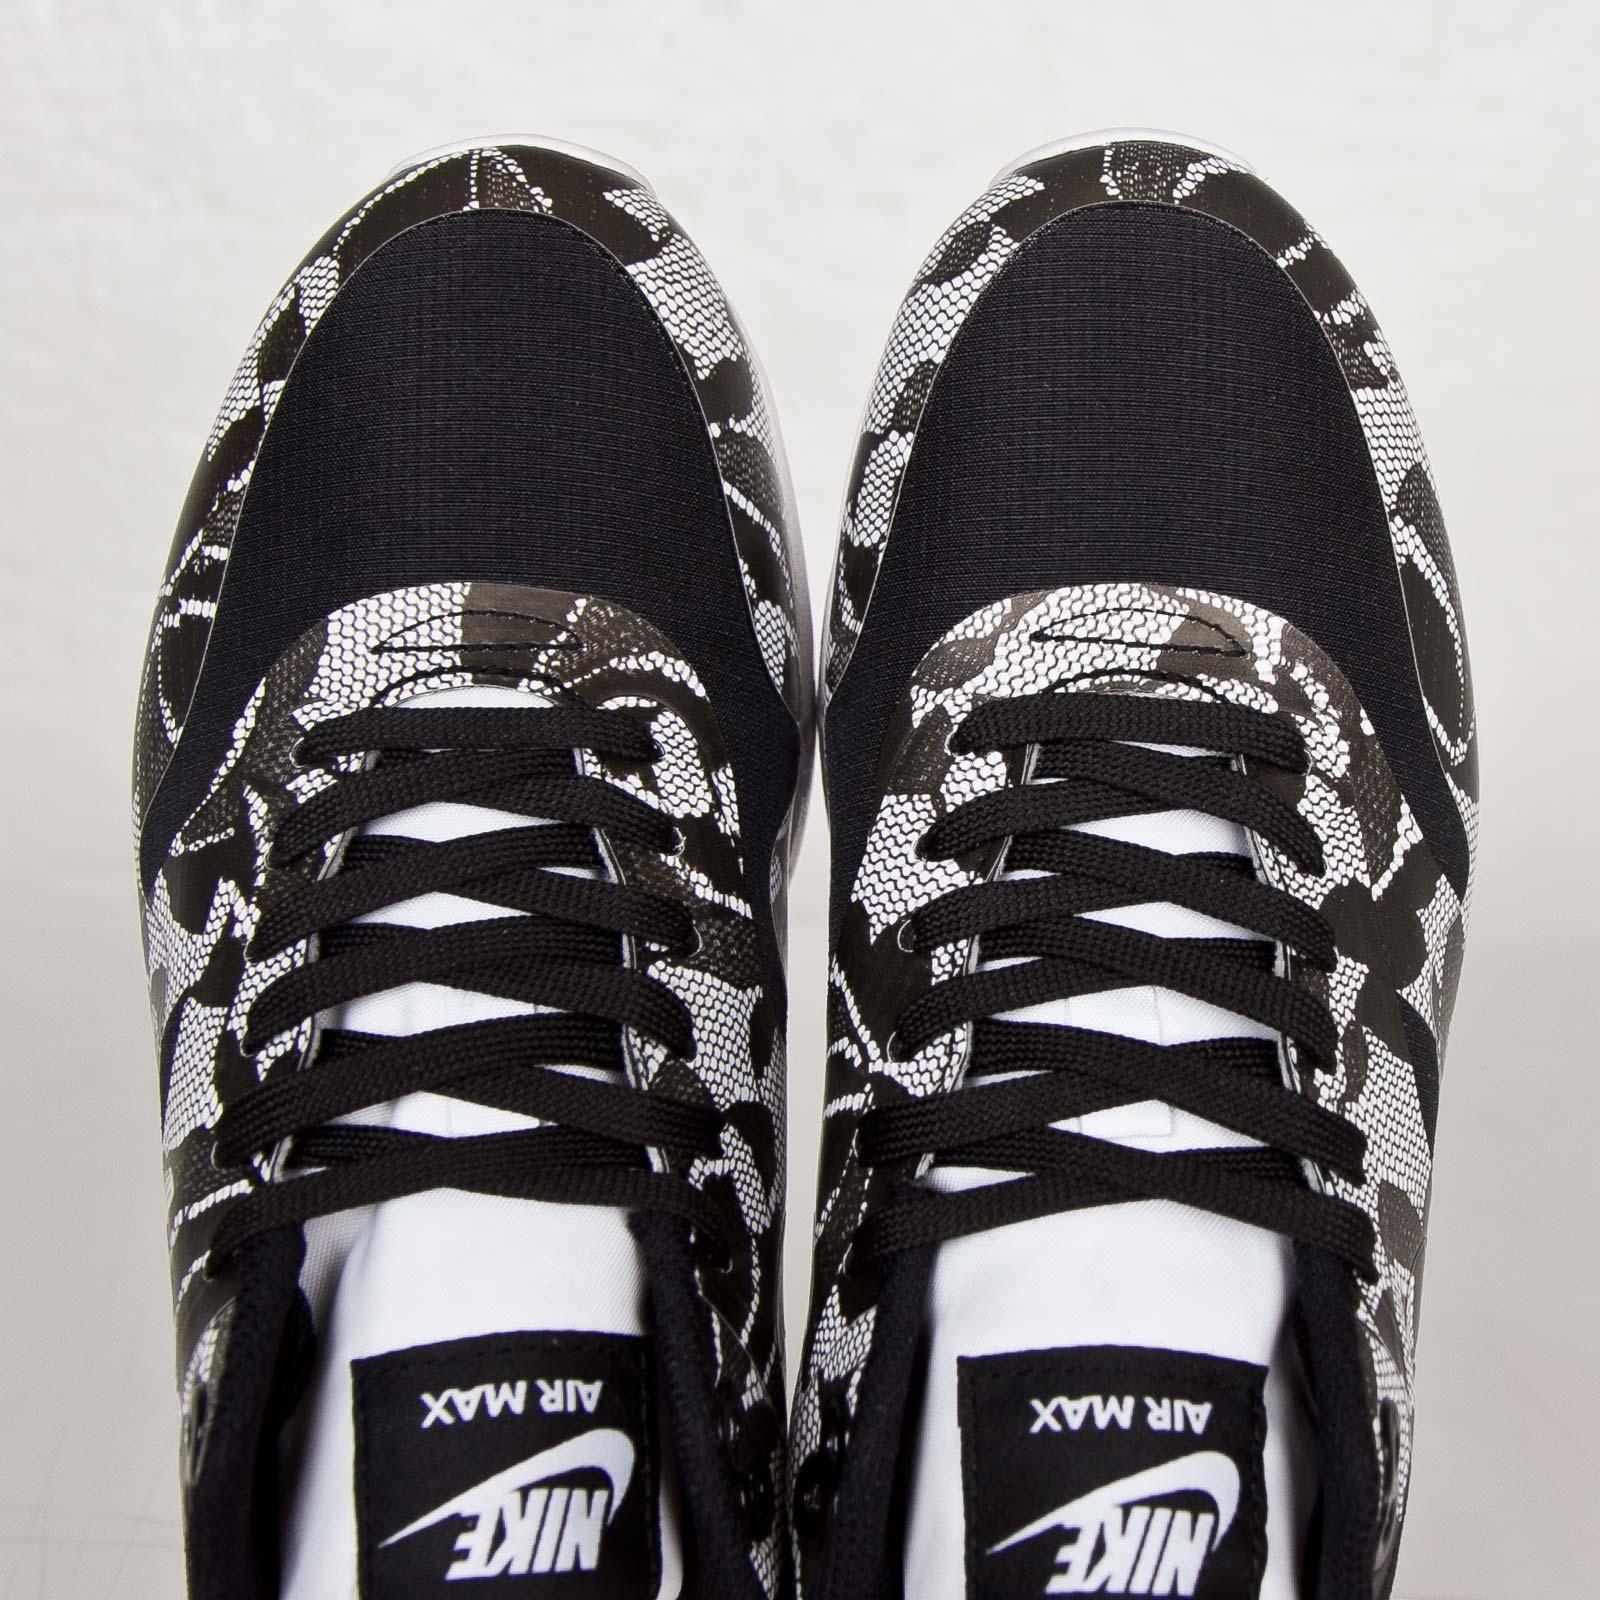 sports shoes 39d4e 6fdfc Nike Wmns Air Max 1 Ultra SP - 7. Close